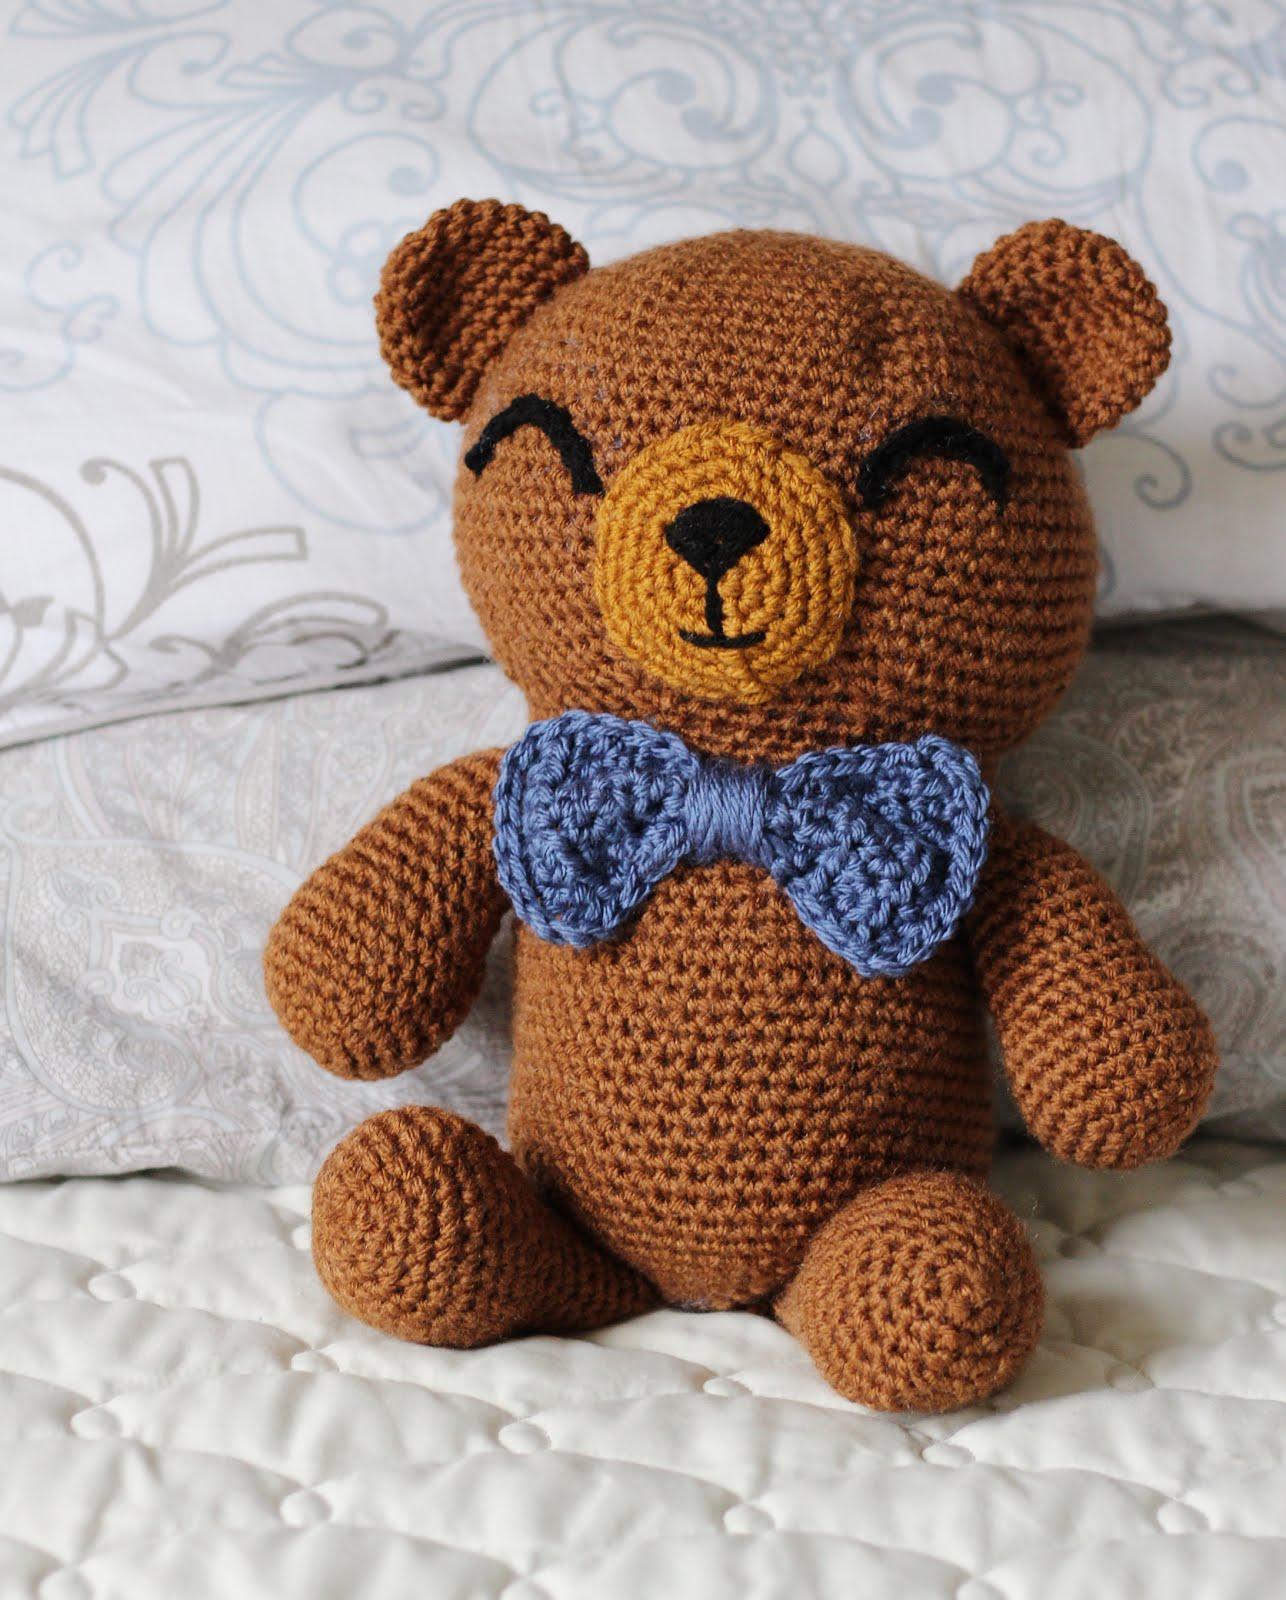 The Cuddliest Crochet Bear Sewrella